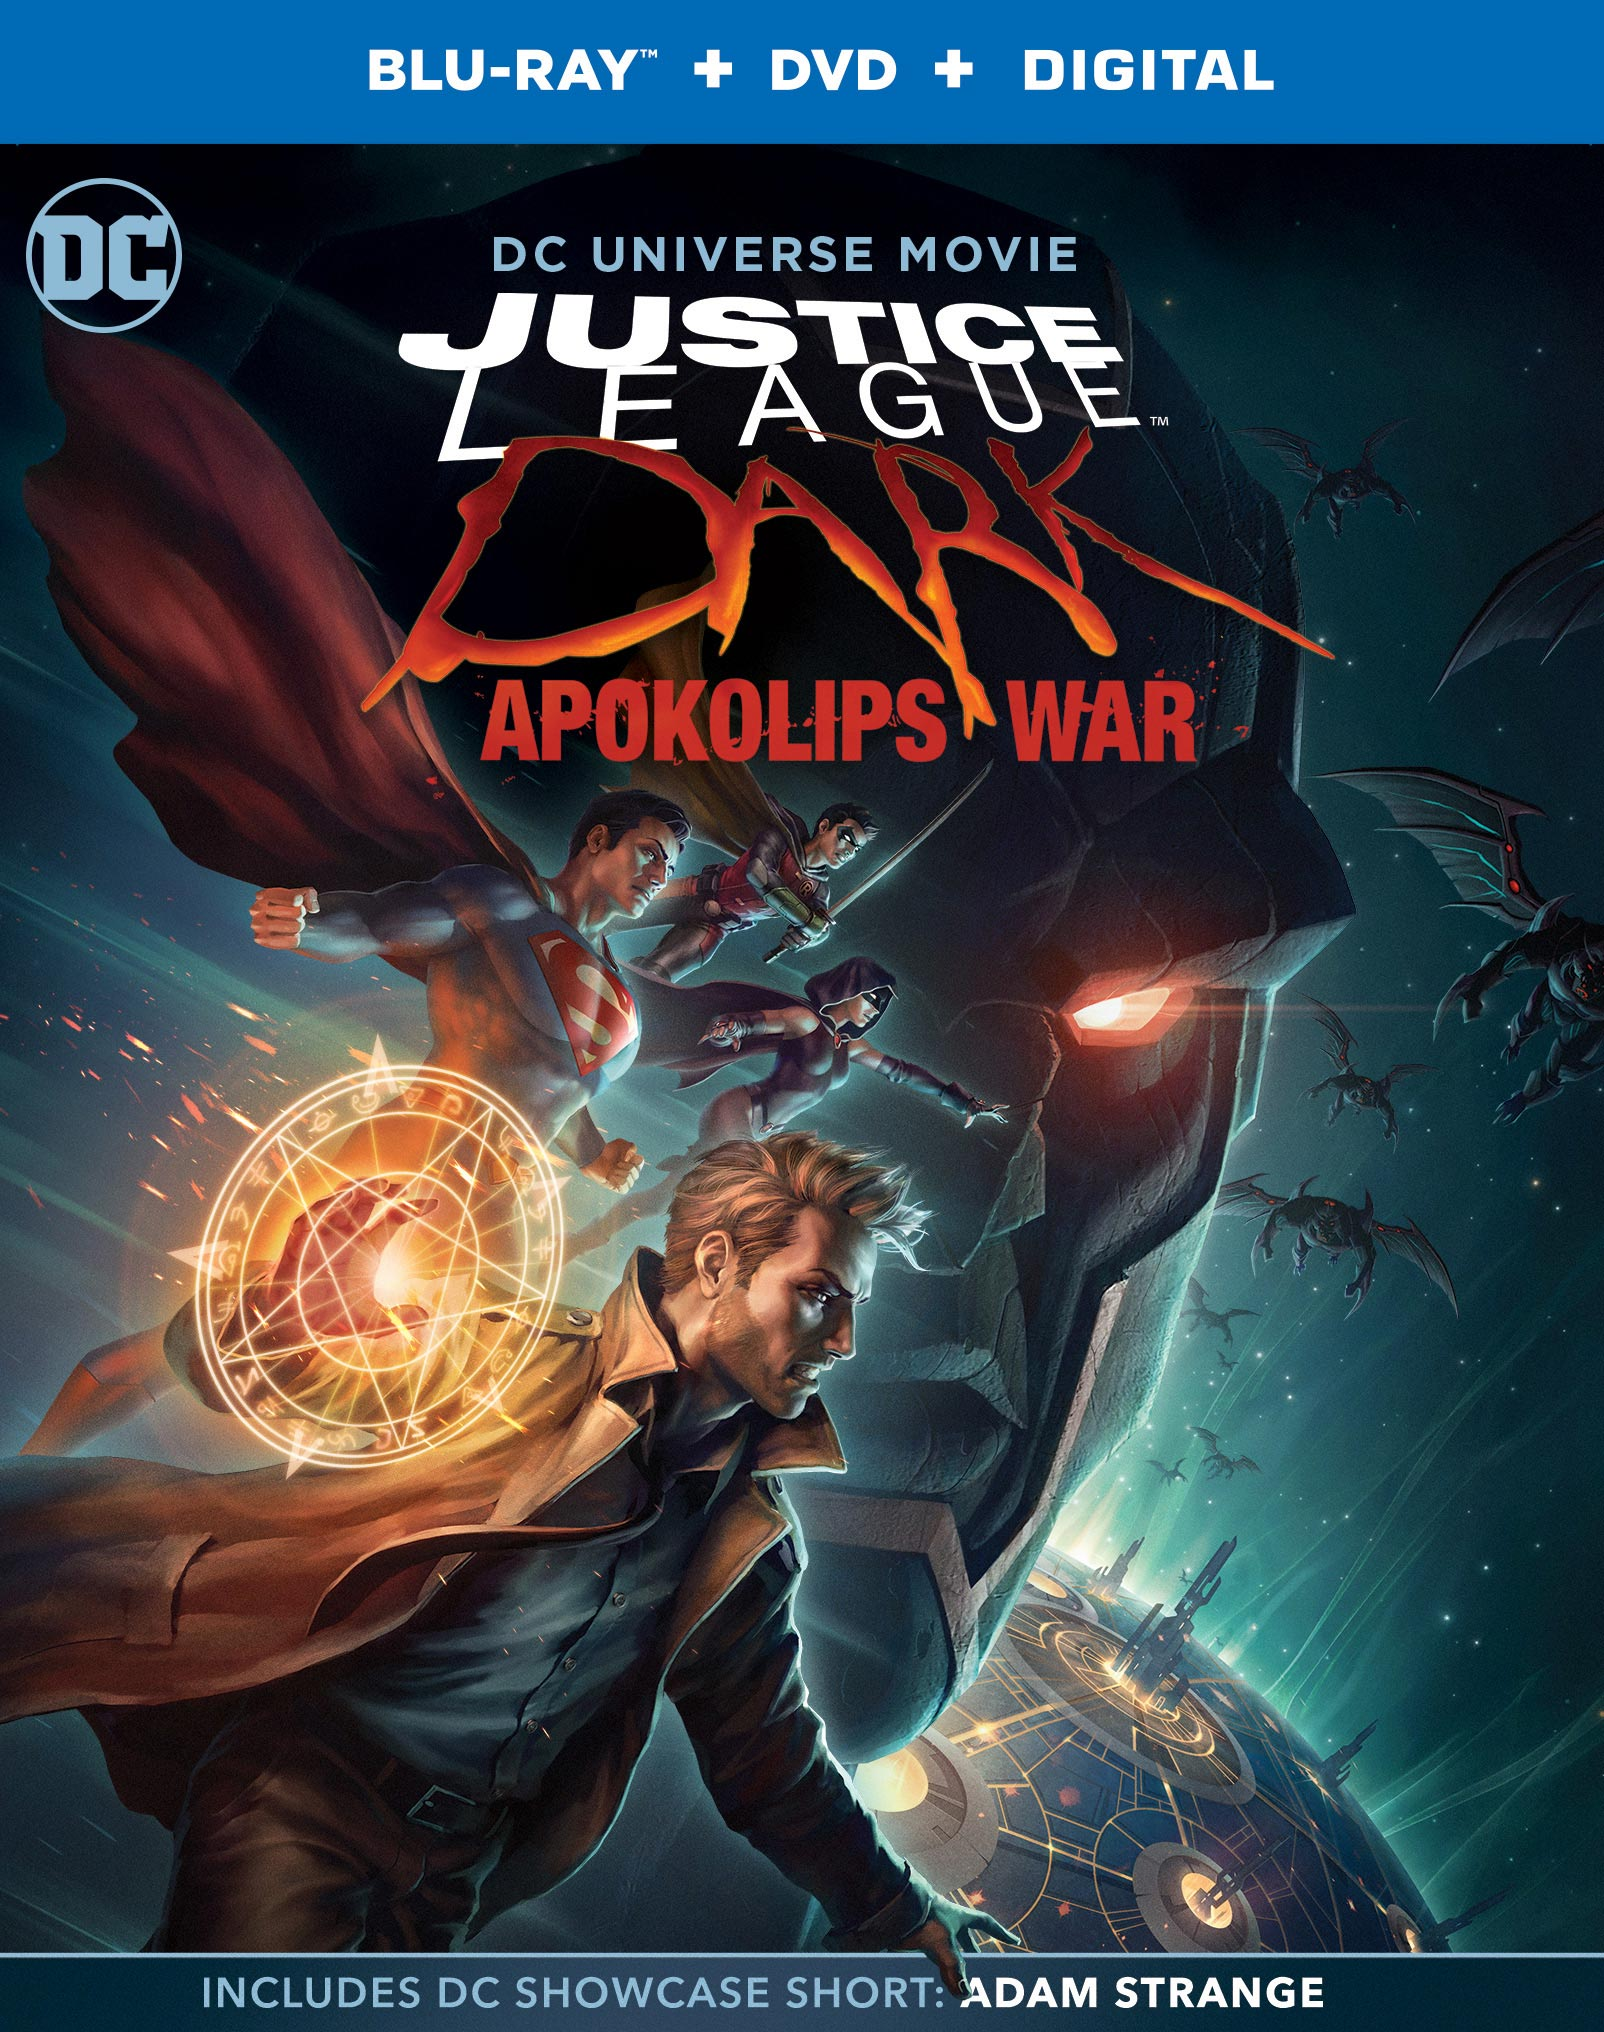 JUSTICE LEAGUE DARK: APOKOLIPS WAR Home Release Details ...